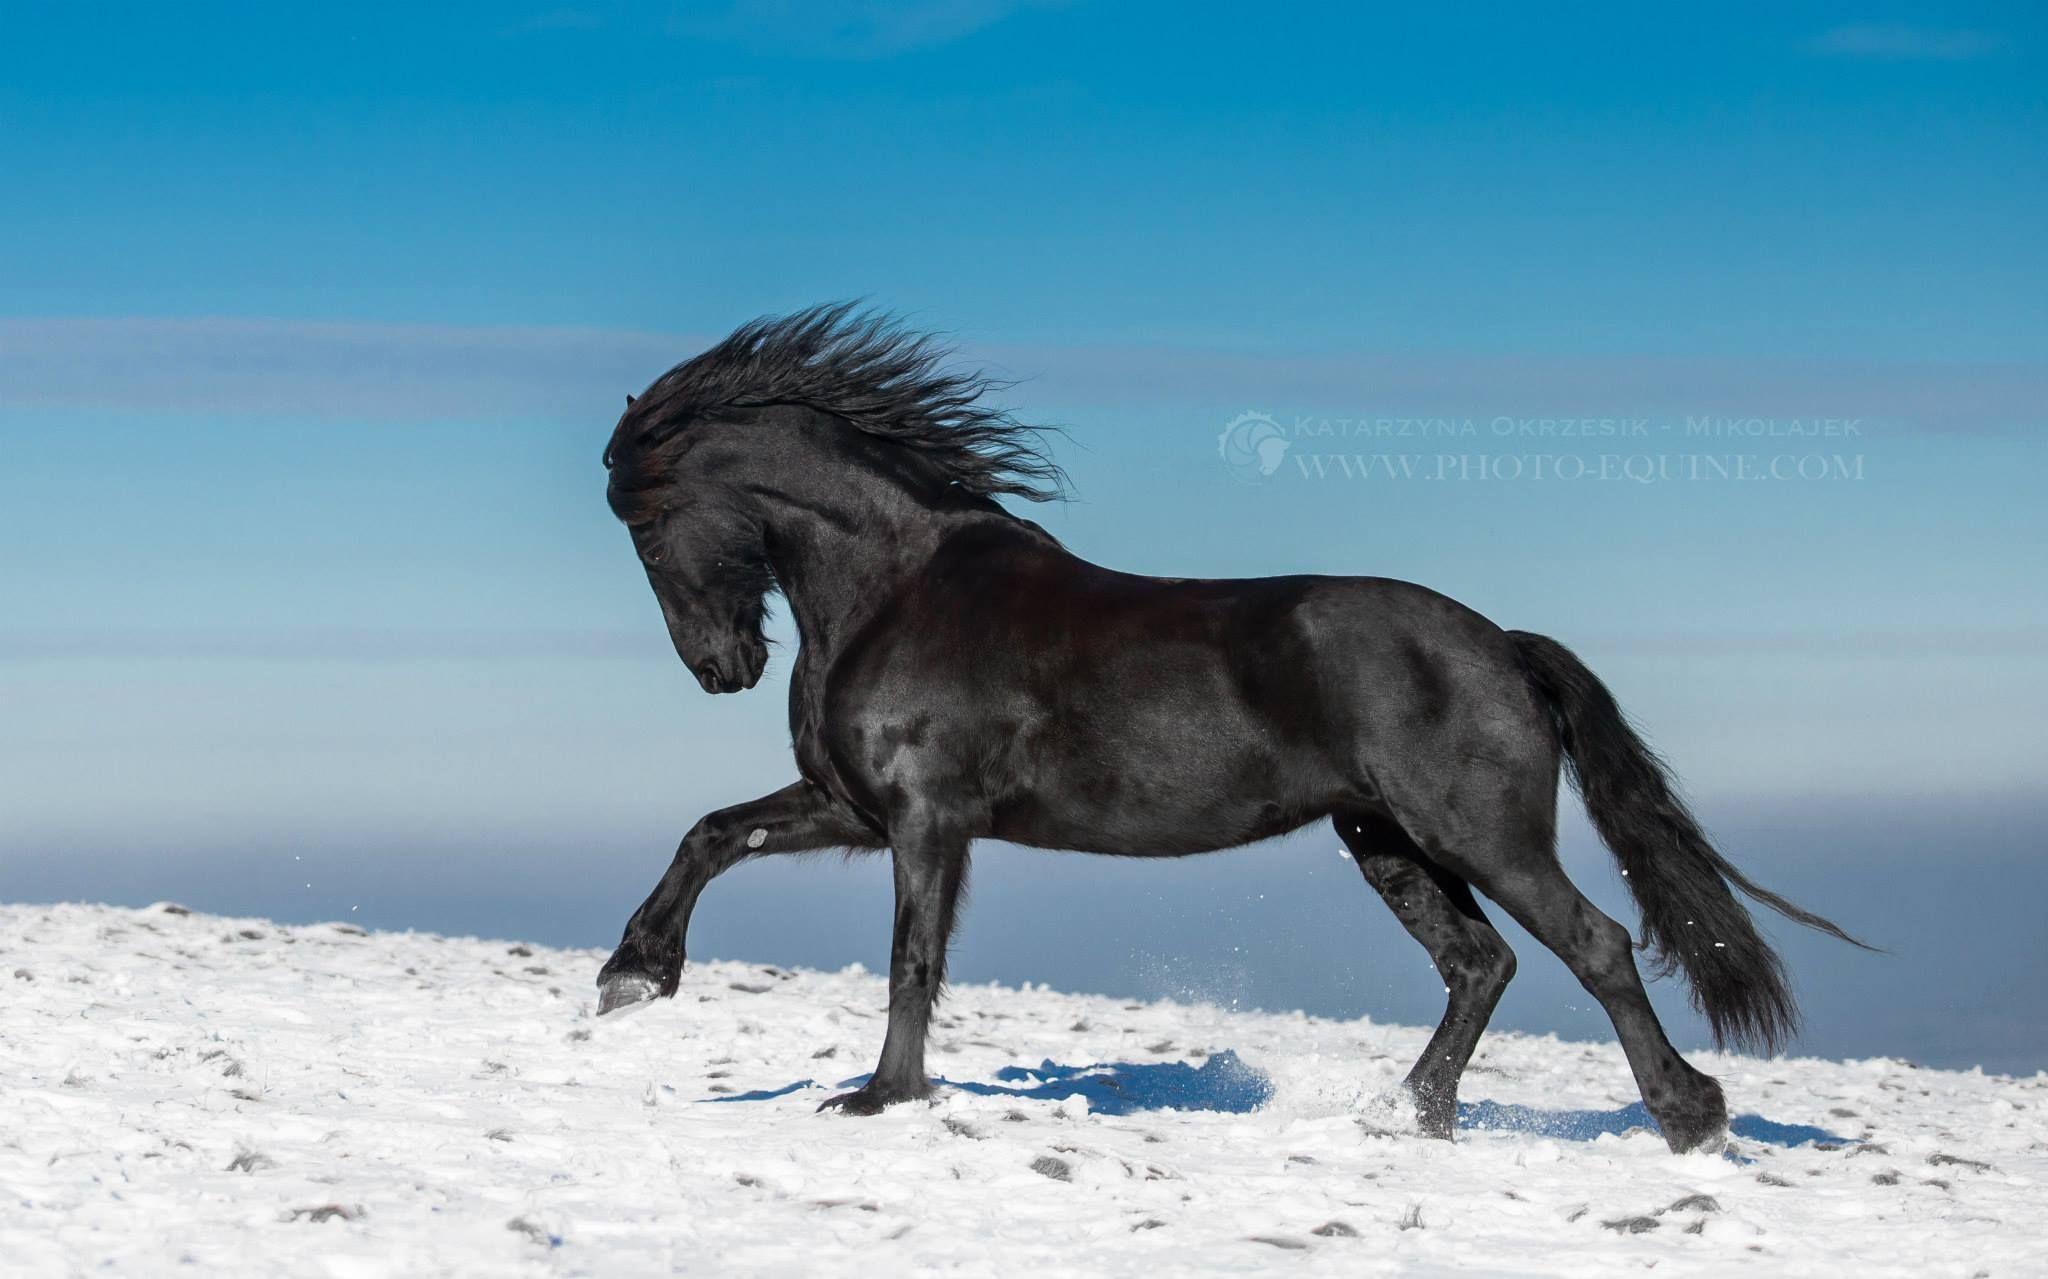 Amazing Wallpaper Horse Snow - eb0d65ee4e124671ffba3f270b5ffb1a  Collection_59871.jpg